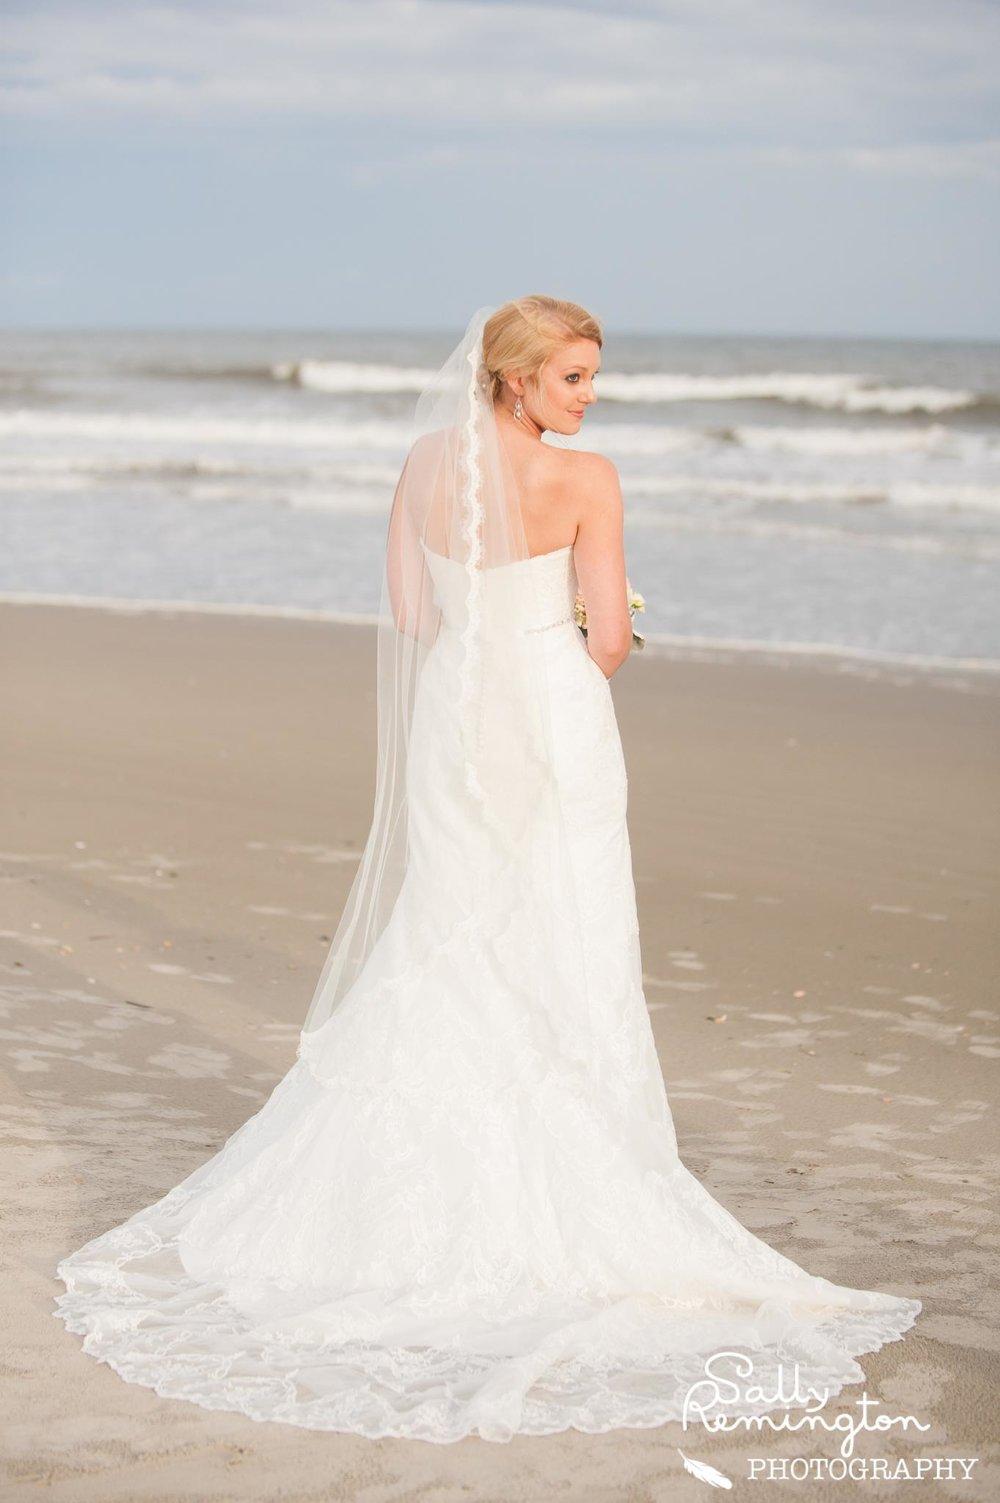 ivory-and-beau-bridal-boutique-savannah-wedding-dress-savannah-wedding-gown-kirstie-maggie-sottero-real-maggie-sottero-bride-beach-wedding-sarah-remington-photography-3.jpg